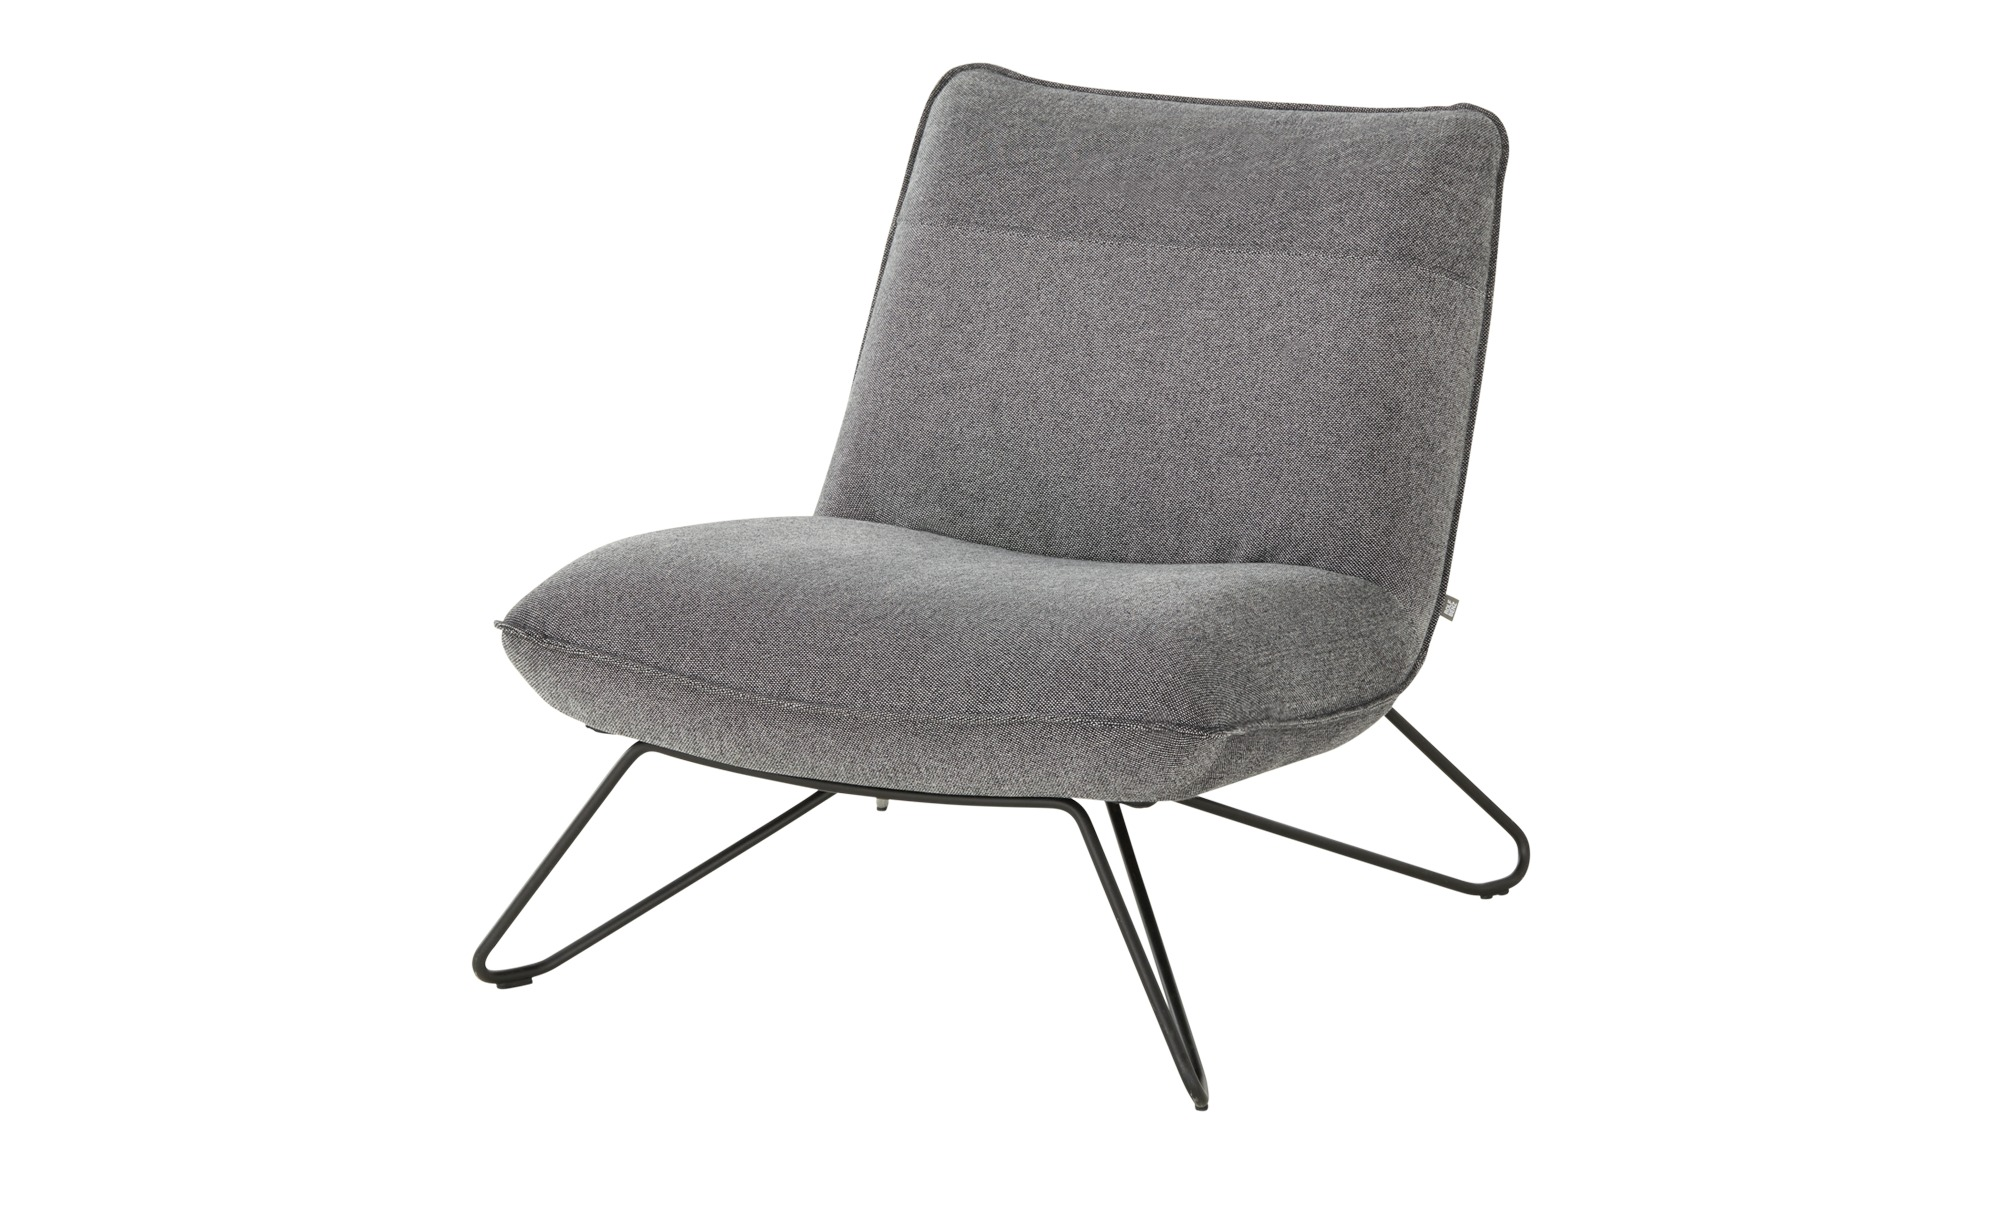 ROLF BENZ Sessel  394 ¦ grau ¦ Maße (cm): B: 75 H: 79 T: 92 Polstermöbel > Sessel > Polstersessel - Höffner